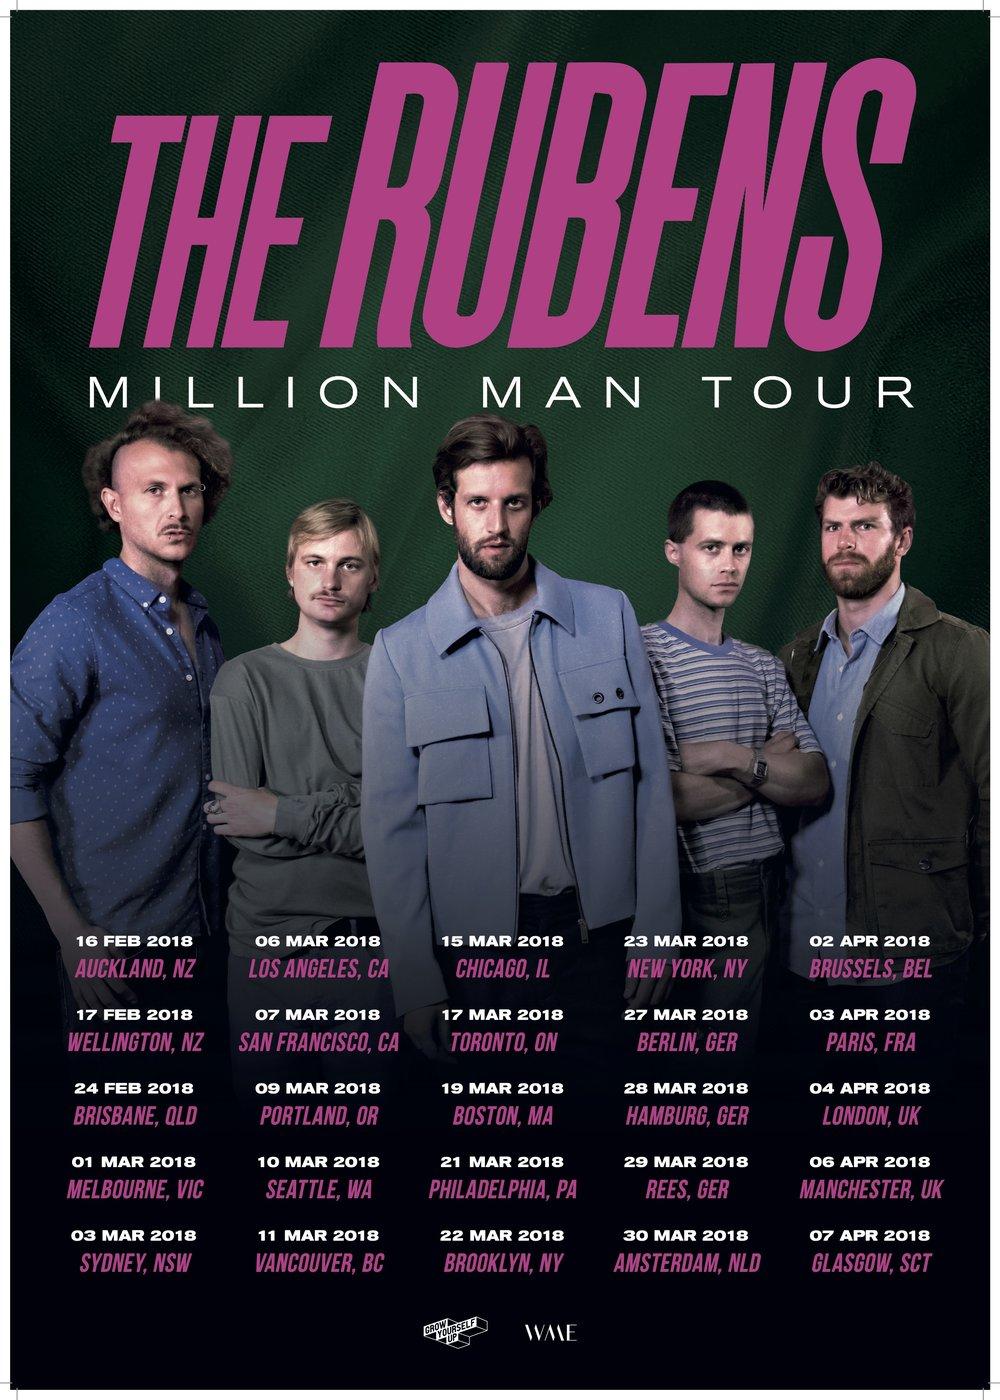 The Rubens - Million Man Tour - A2 Cafe Poster - 02 (International).jpg